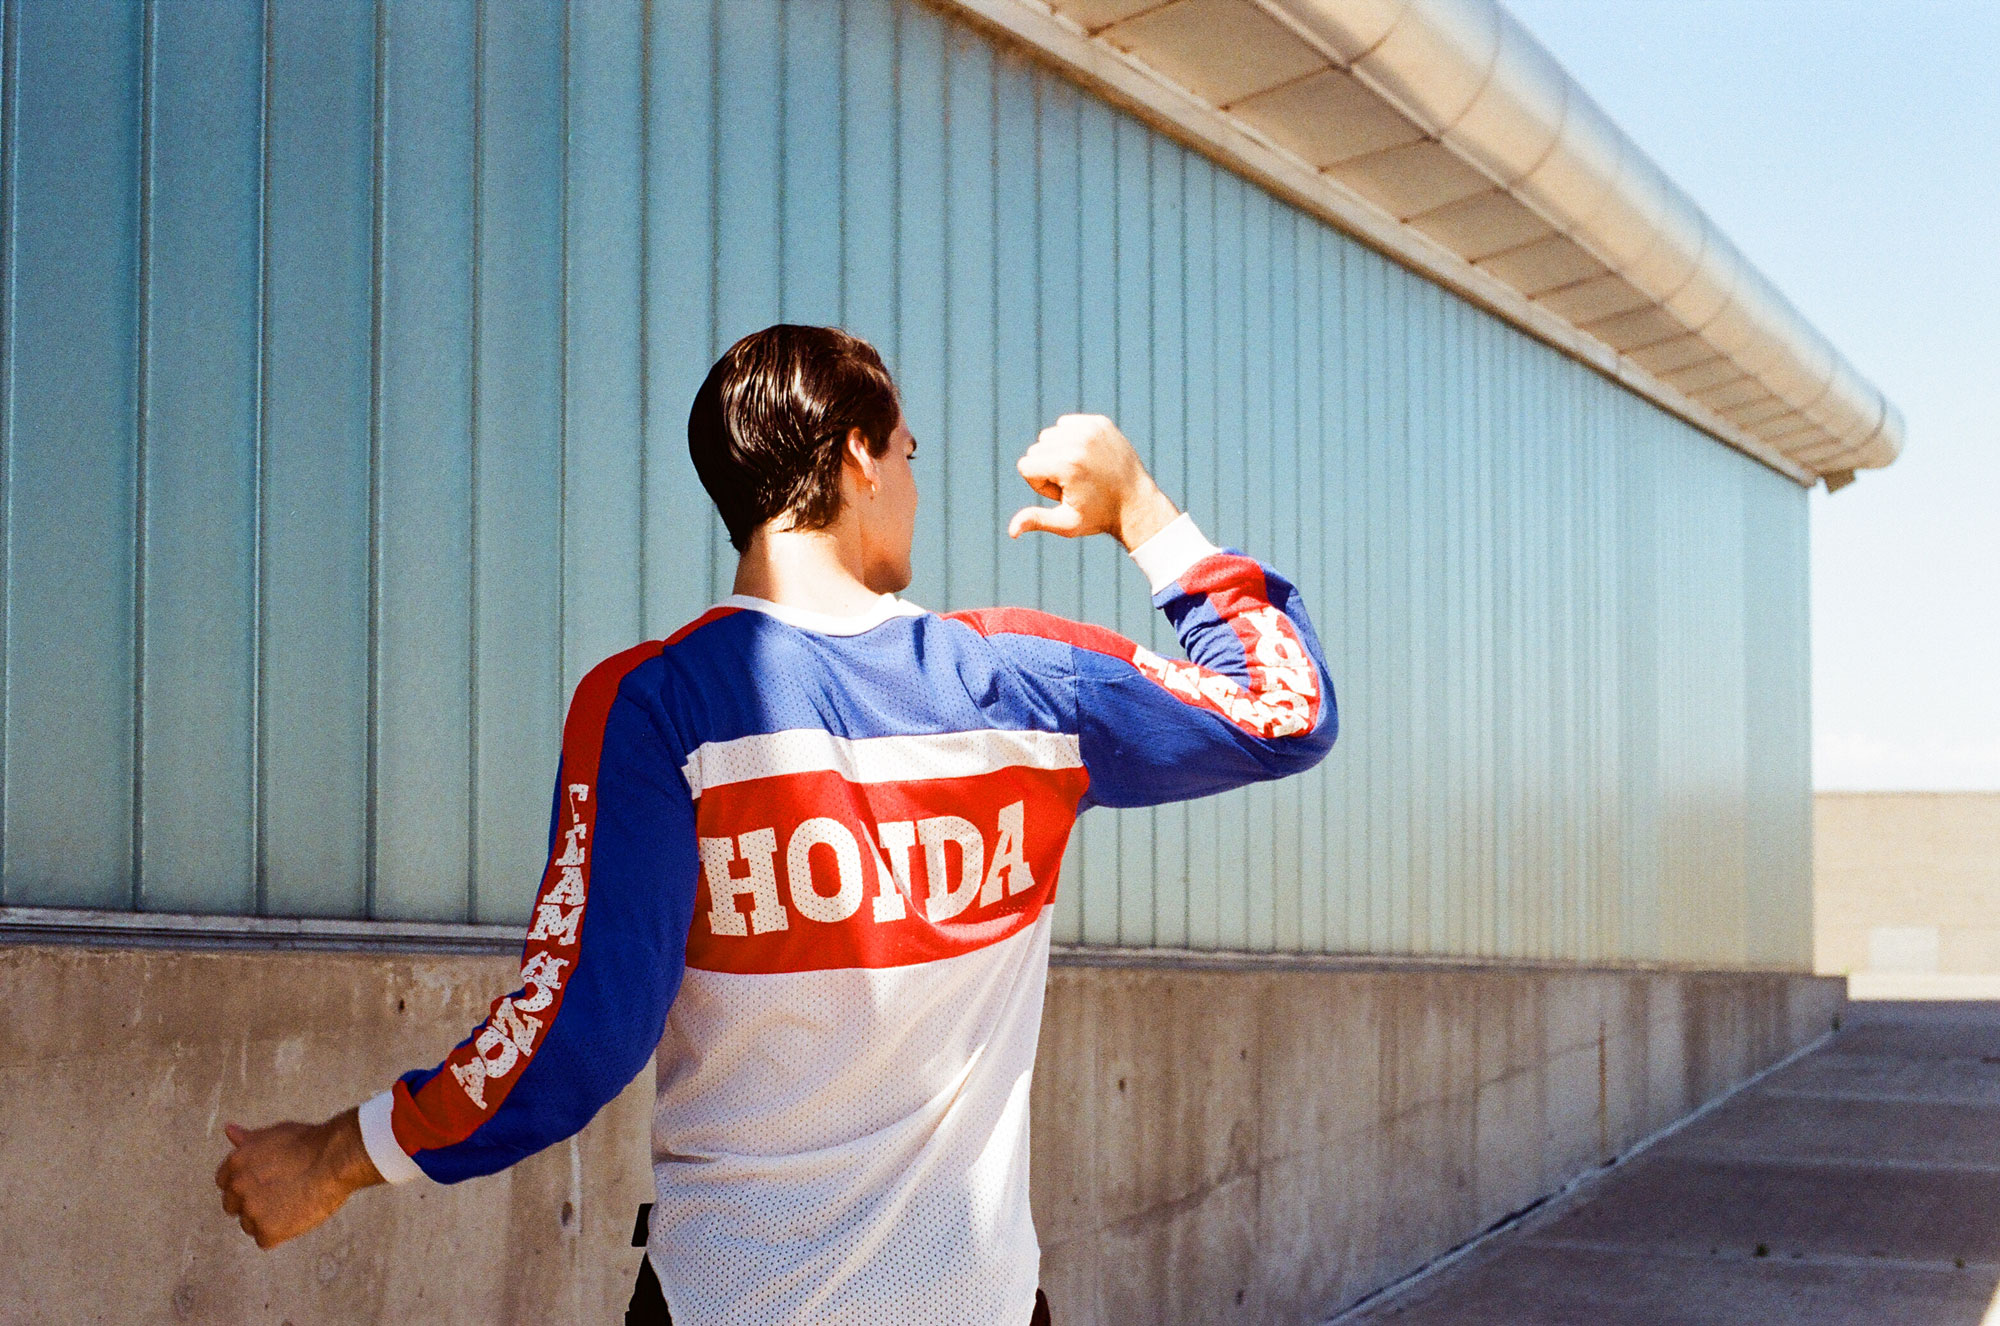 http://regiamag.com/giulia-ricciotti/  PH & Styling & M&H: Giulia Ricciotti  @giuliaricciotti   Model: Franco for DHRModels  @francodbarrera   Clothes: AyNotDead, Trosman, Adidas, Nike, Ungaro, Codigo, Honda